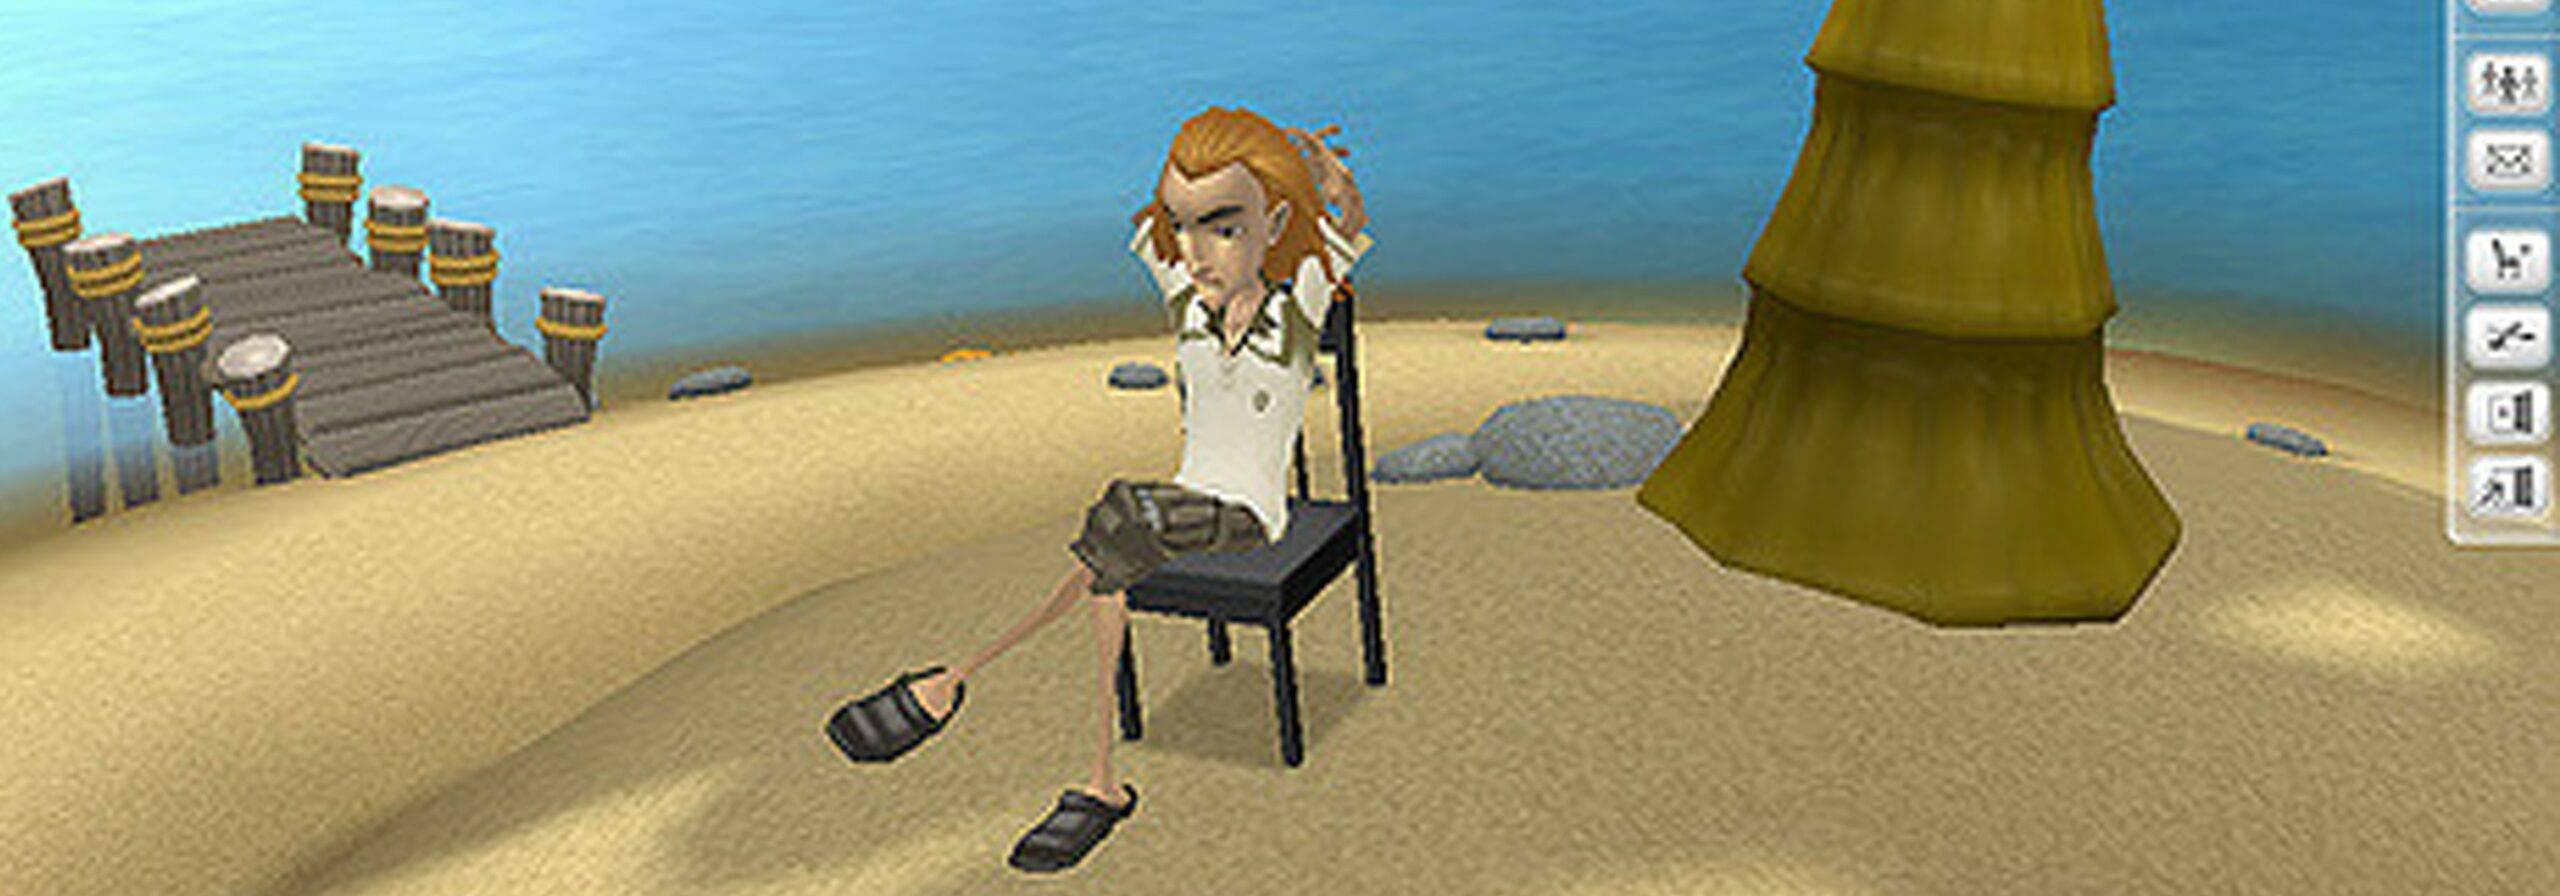 Google Lively 3D virtual world simulator